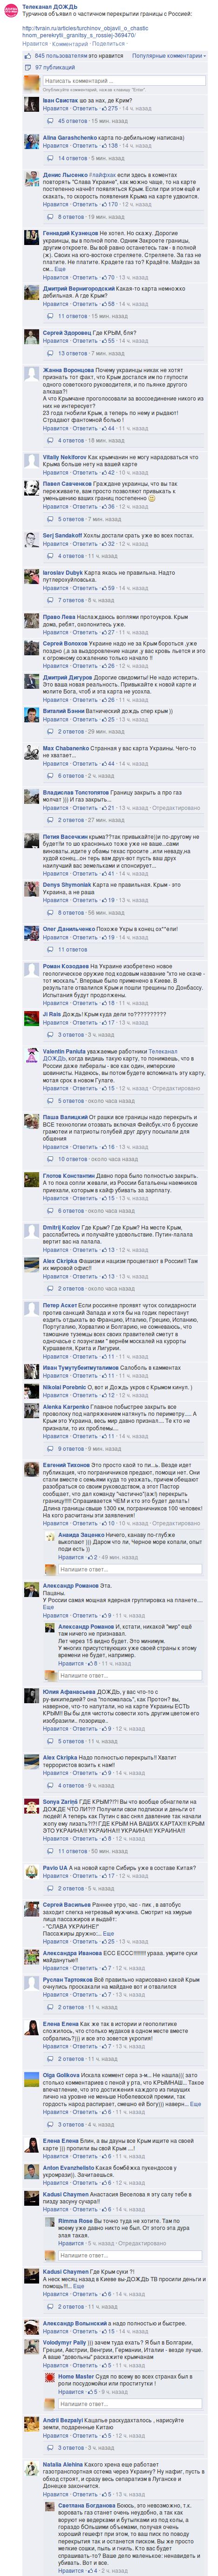 Телеканал ДОЖДЬ - Фотографии Хроники